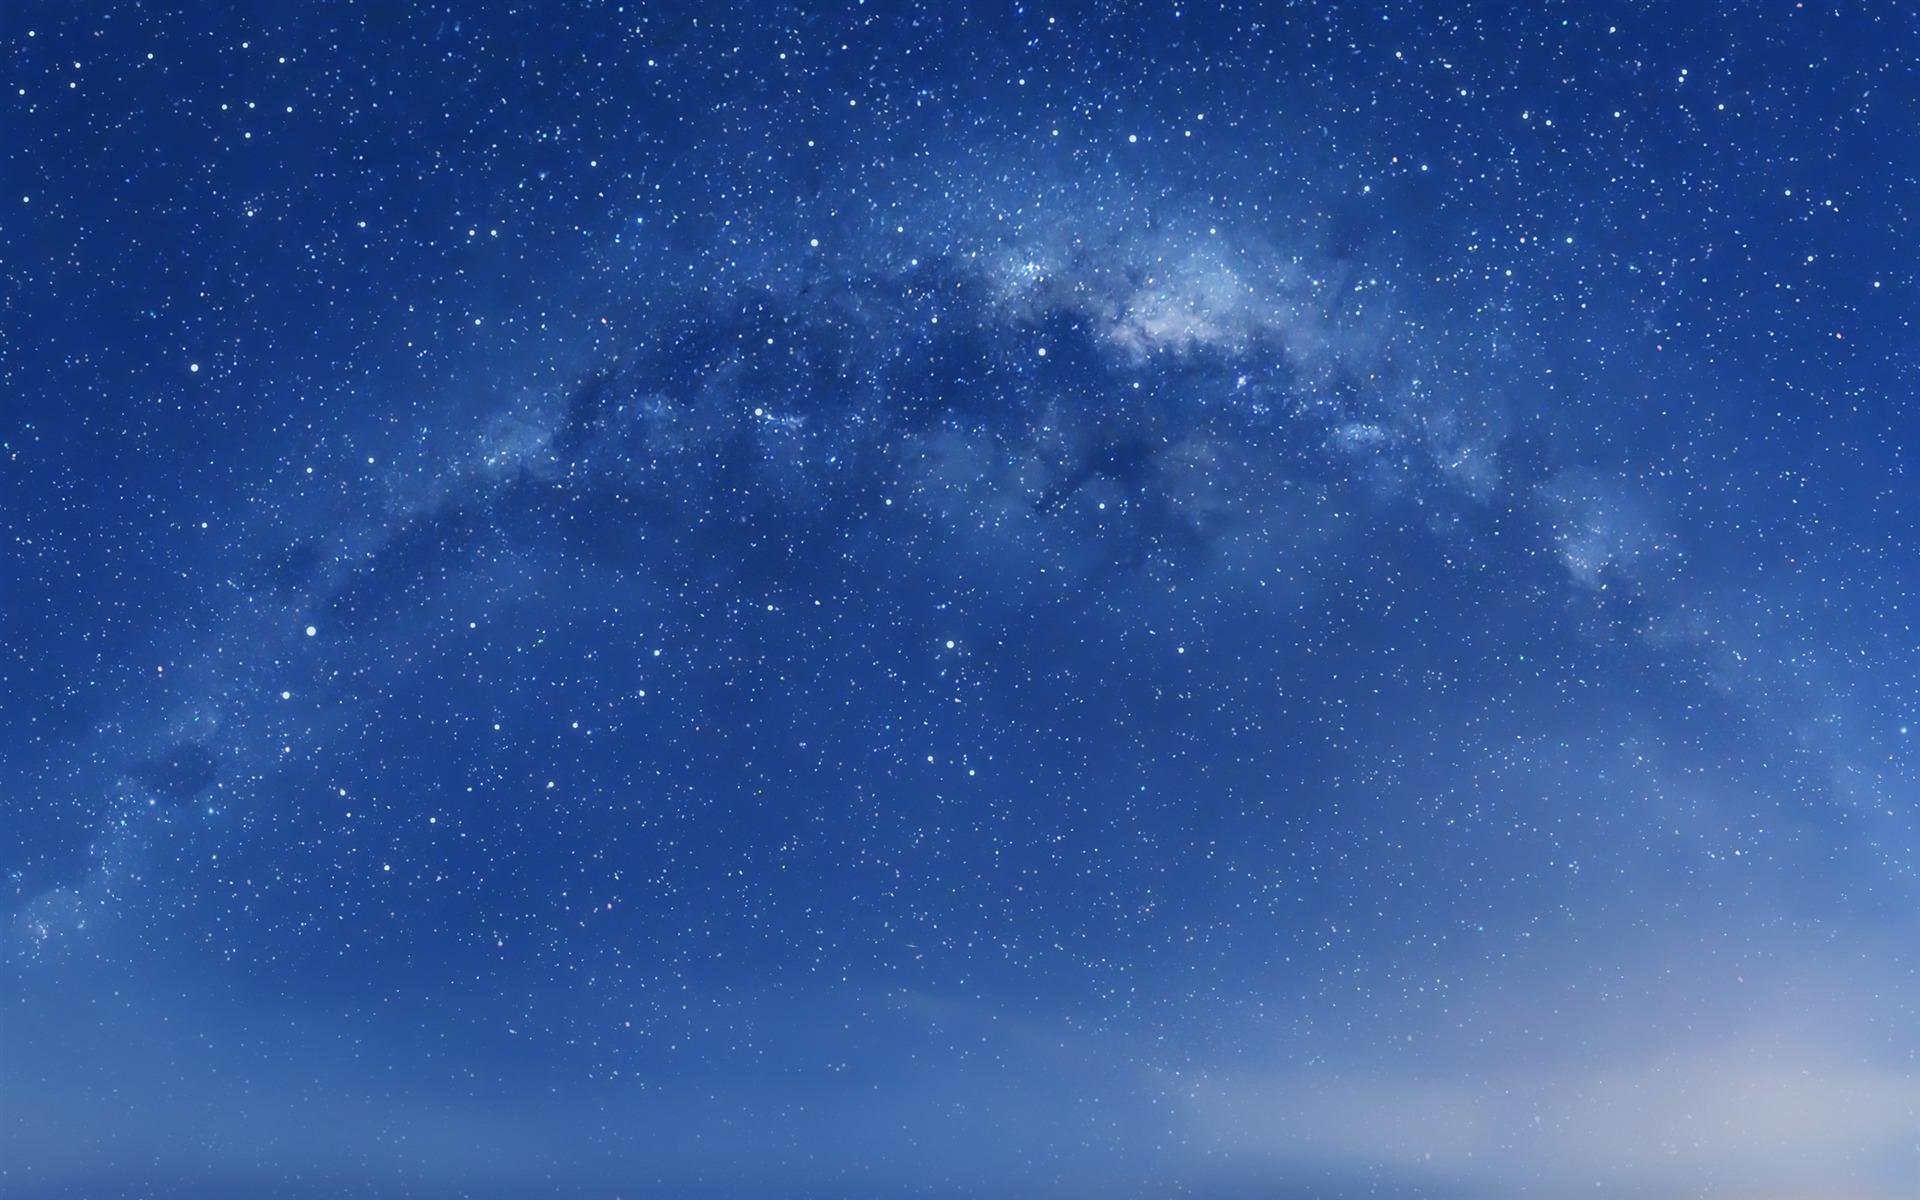 Star in the Galaxy-Mac OS Wallpaper Preview | 10wallpaper.com